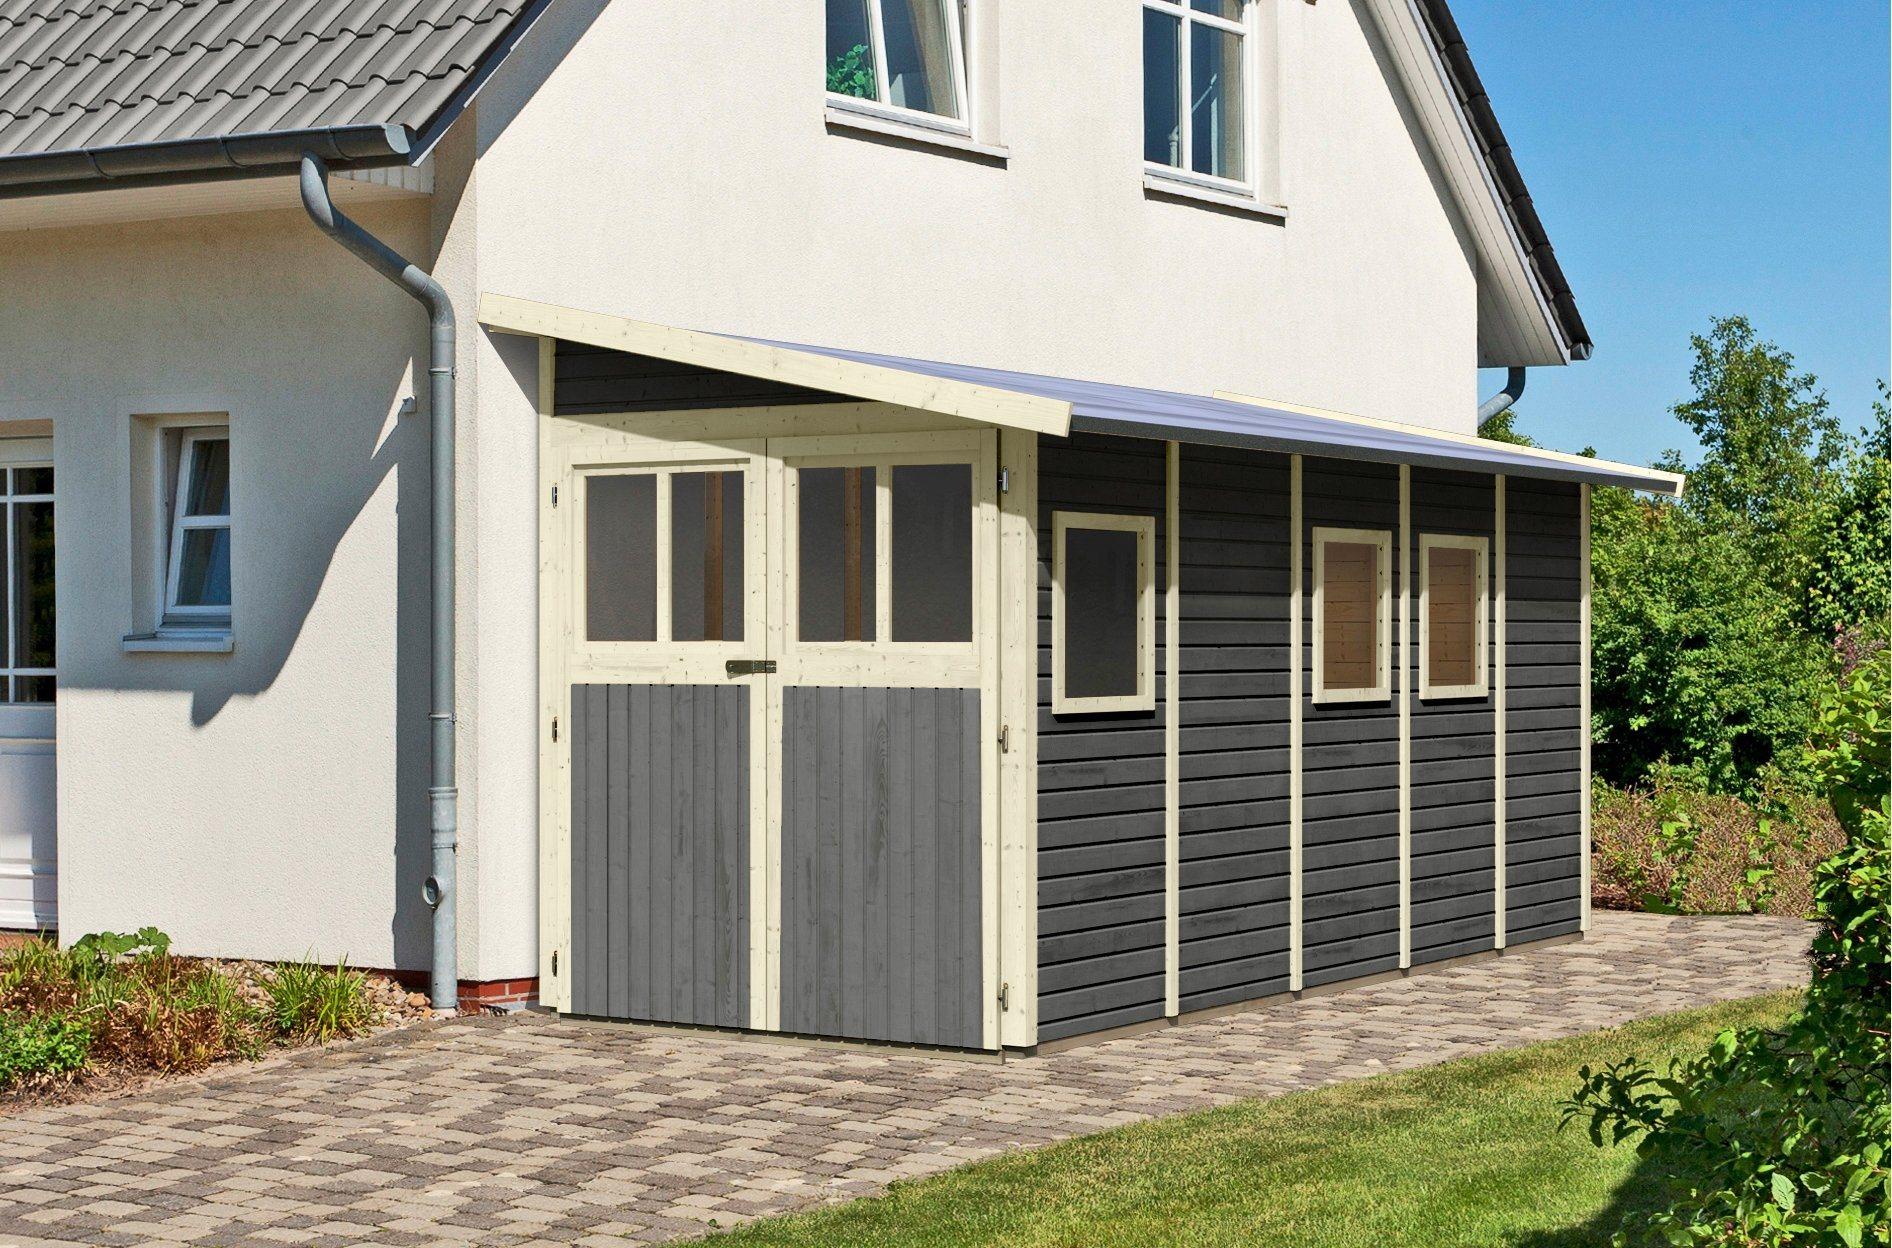 KARIBU Gartenhaus »Wittenburg 5«, BxT: 200x469 cm | Garten > Gartenhäuser | Farbig | Karibu